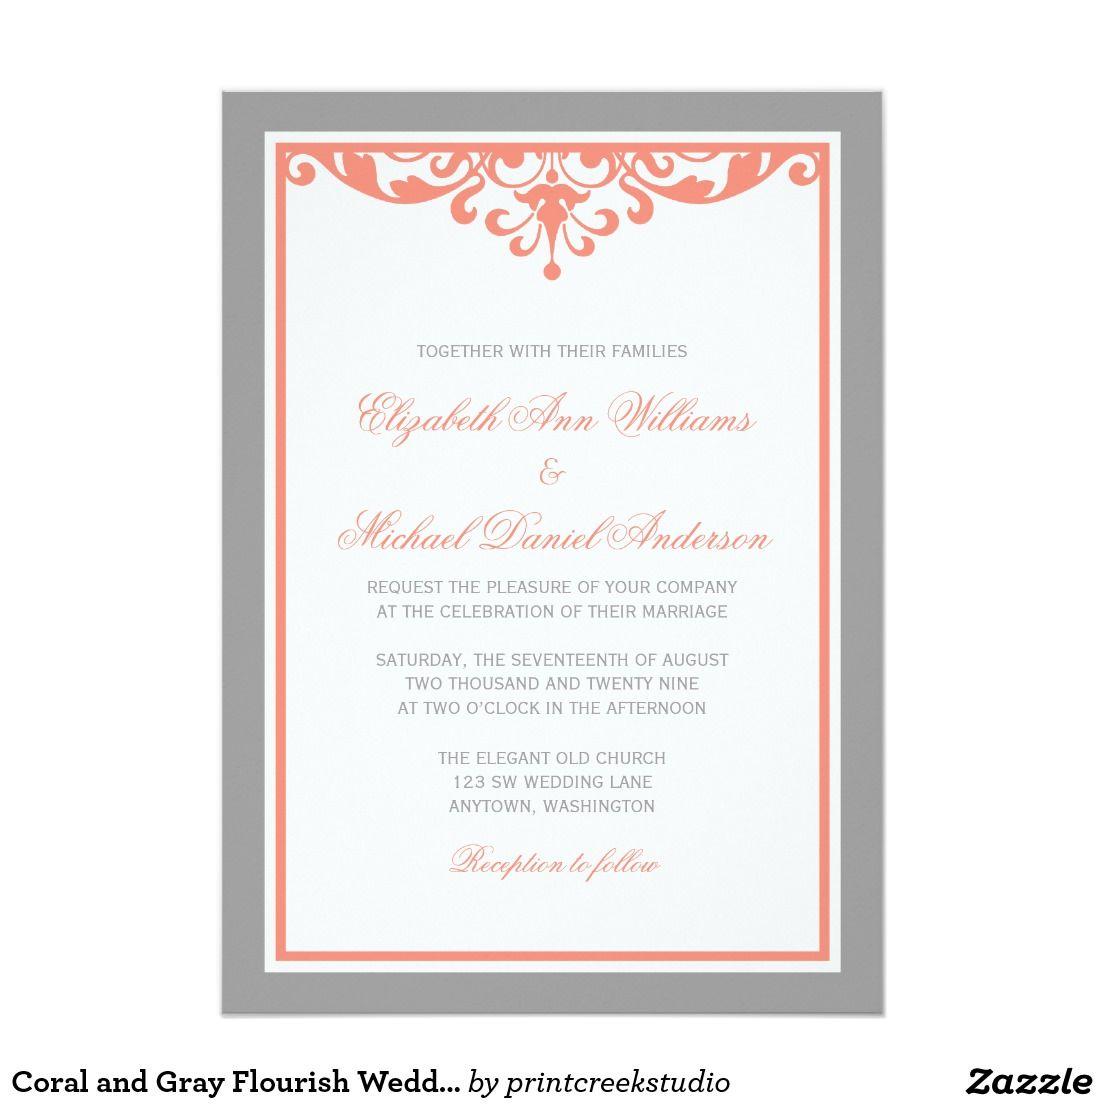 Coral and Gray Flourish Wedding Invitations | FORMAL WEDDING ...